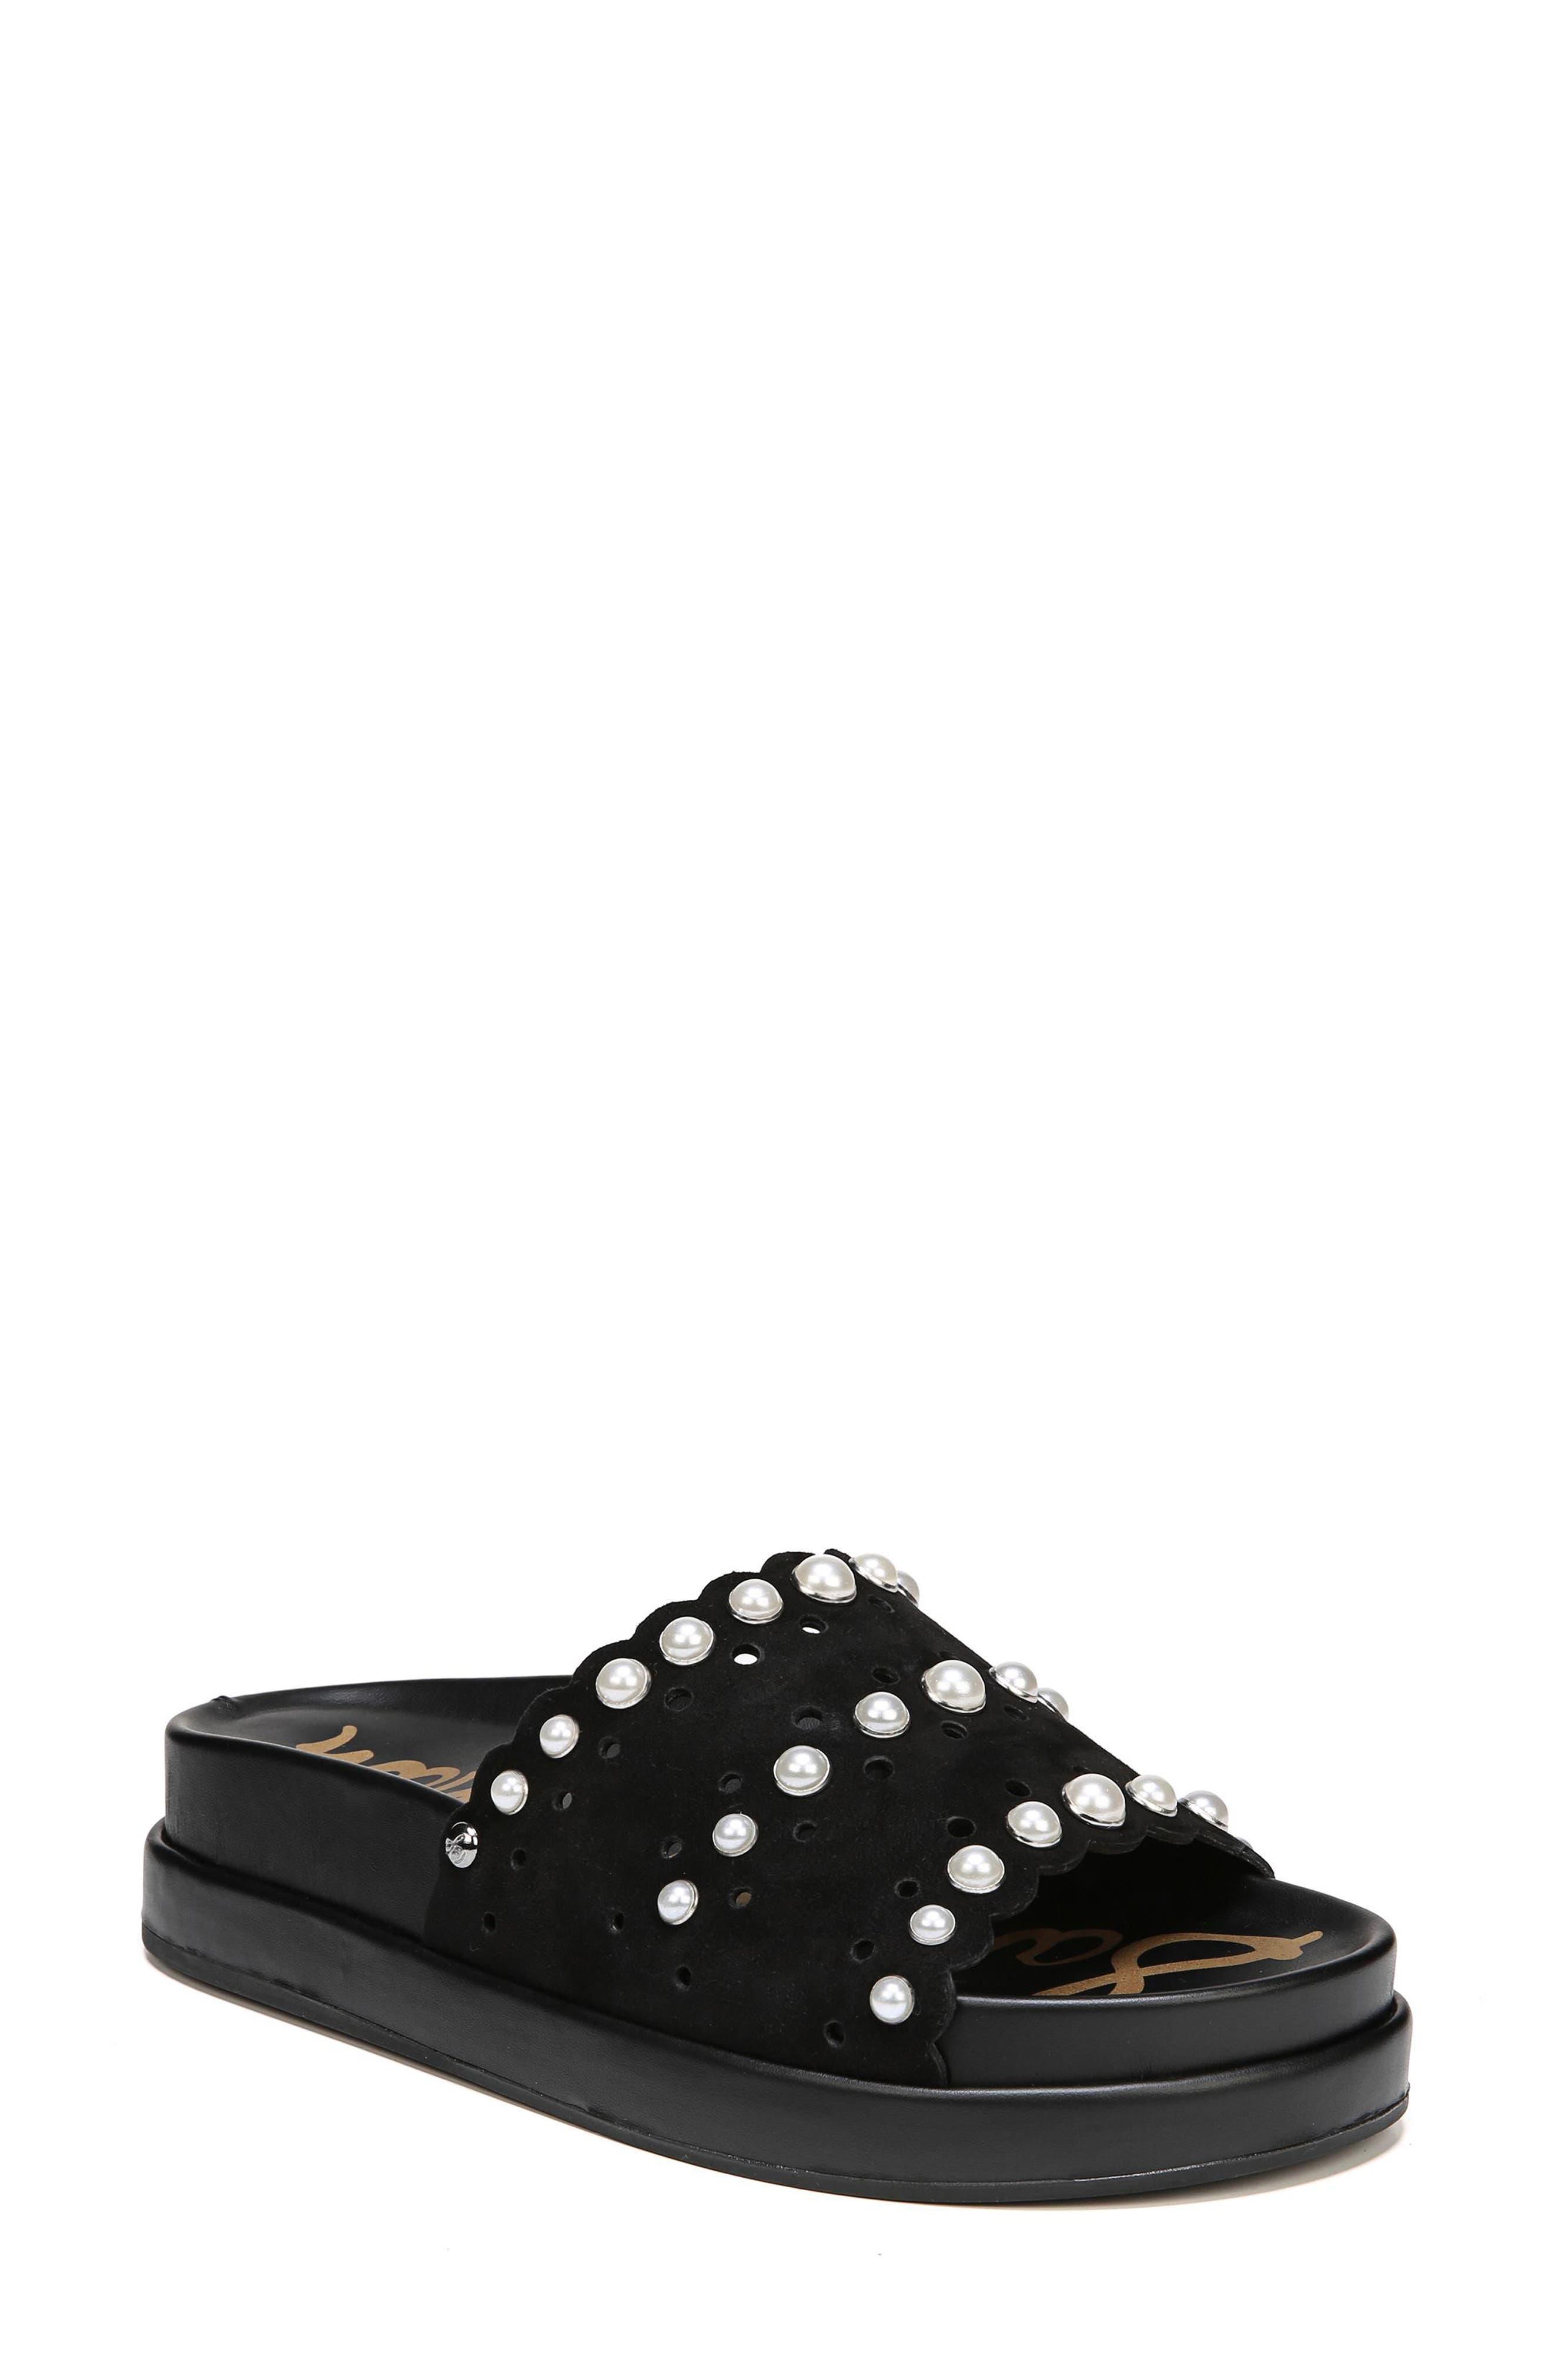 Sera Slide Sandal,                             Main thumbnail 1, color,                             BLACK SUEDE